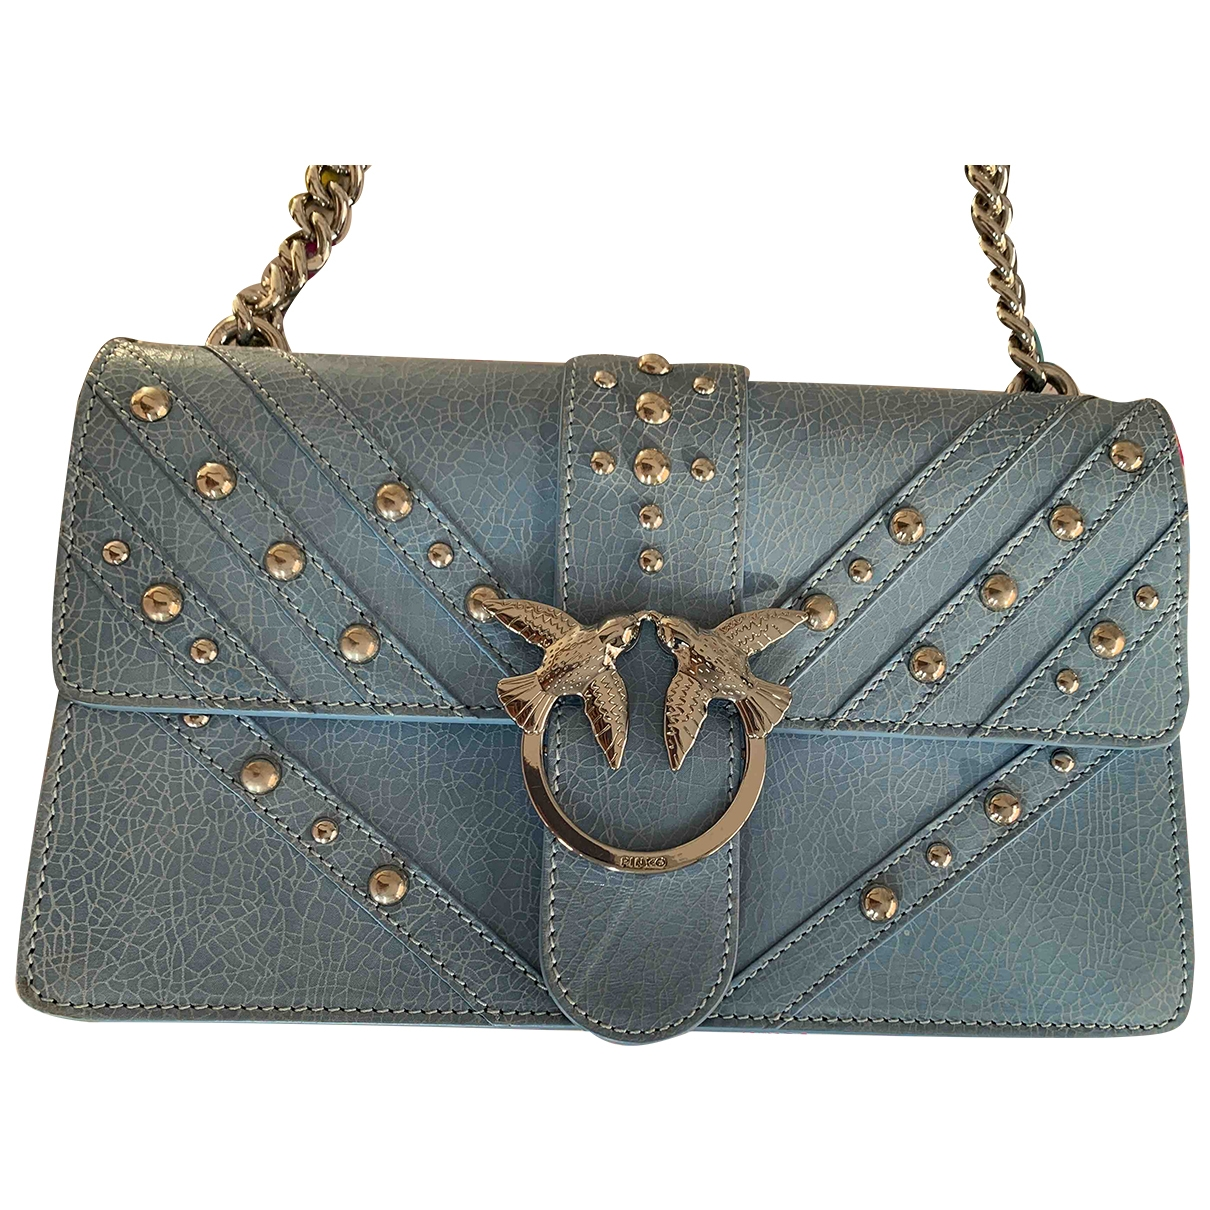 Pinko \N Turquoise Leather handbag for Women \N